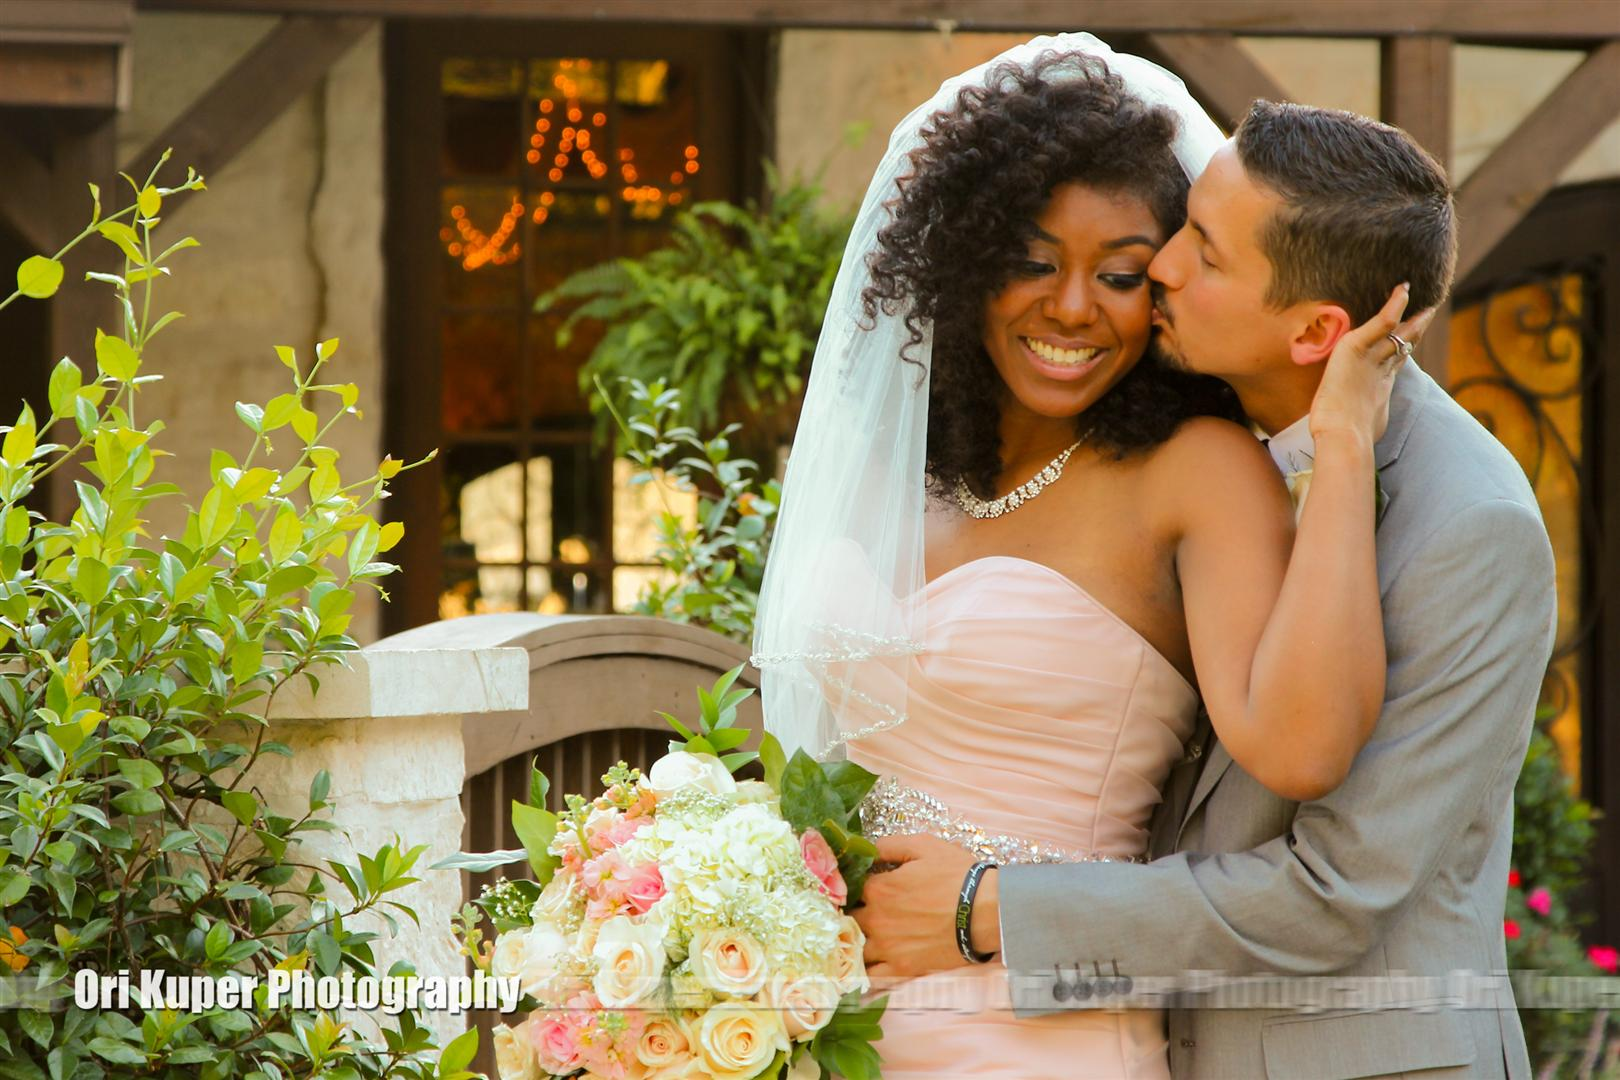 Ori Kuper Photography Weddings Josh Aubrey IMG_4573.jpg